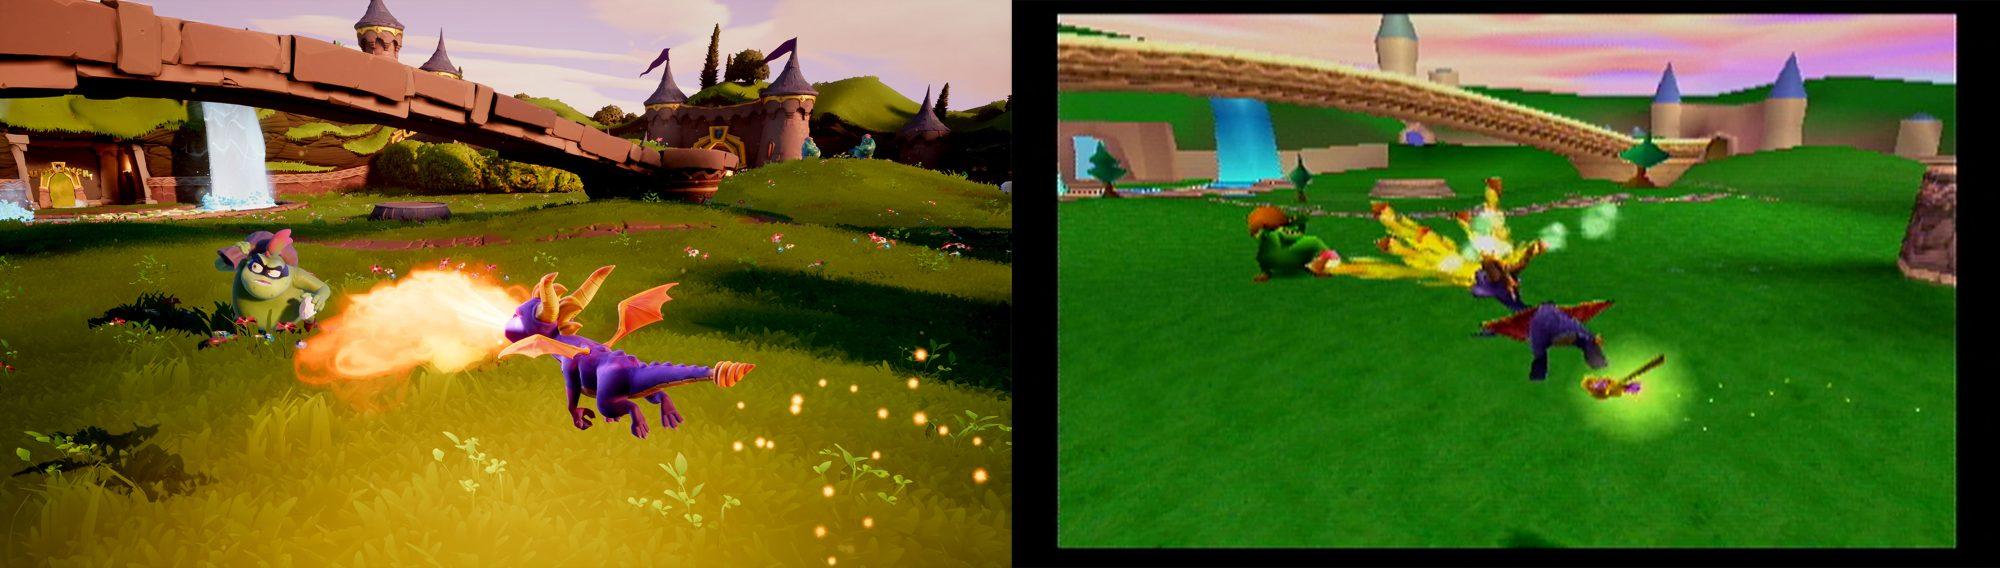 Spyro Reignited Trilogy_006